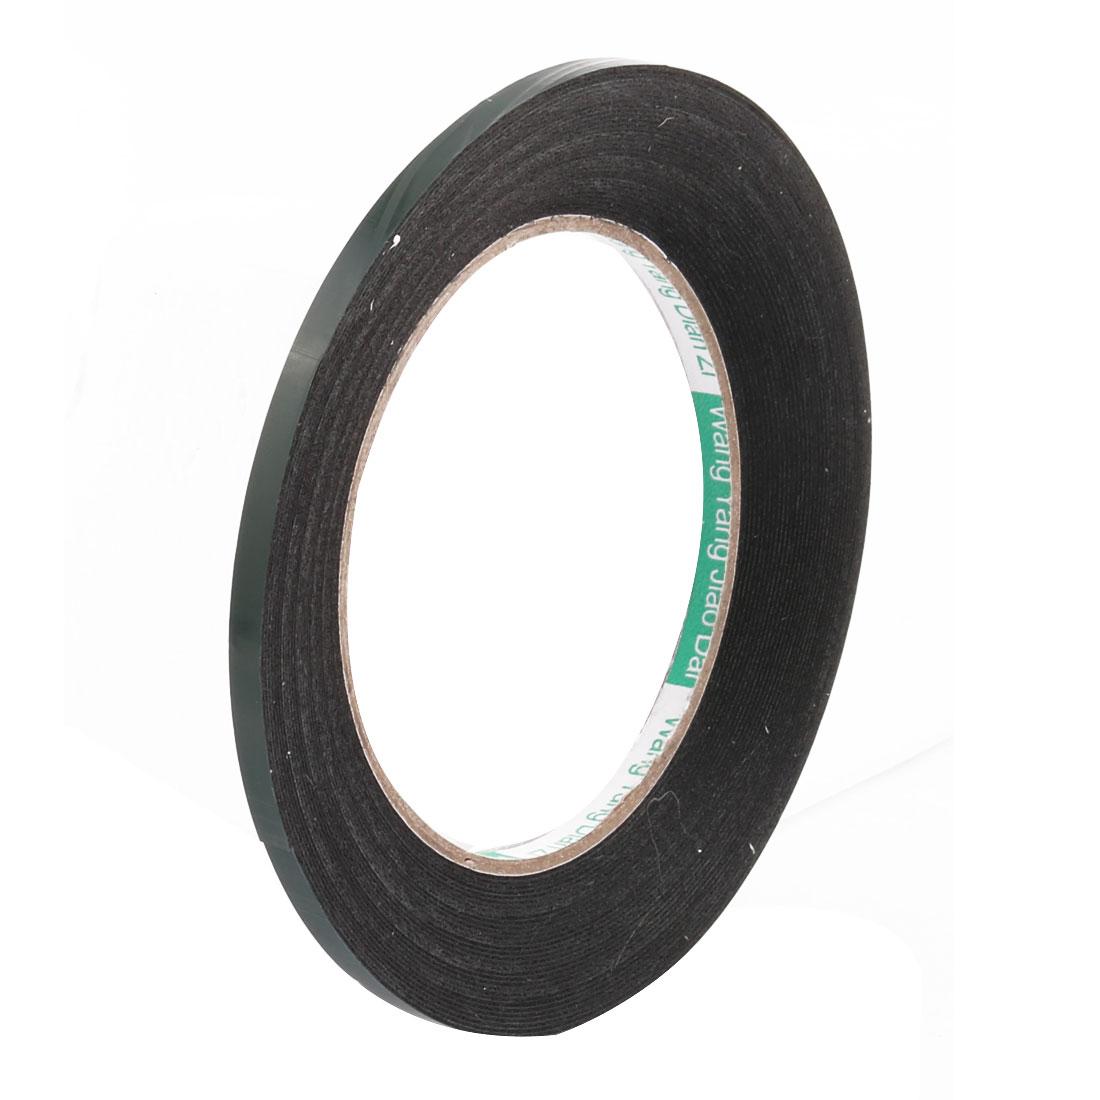 5mmx0.5mm Double Sided Sponge Tape Adhesive Sticker Foam Glue Strip Sealing 10M